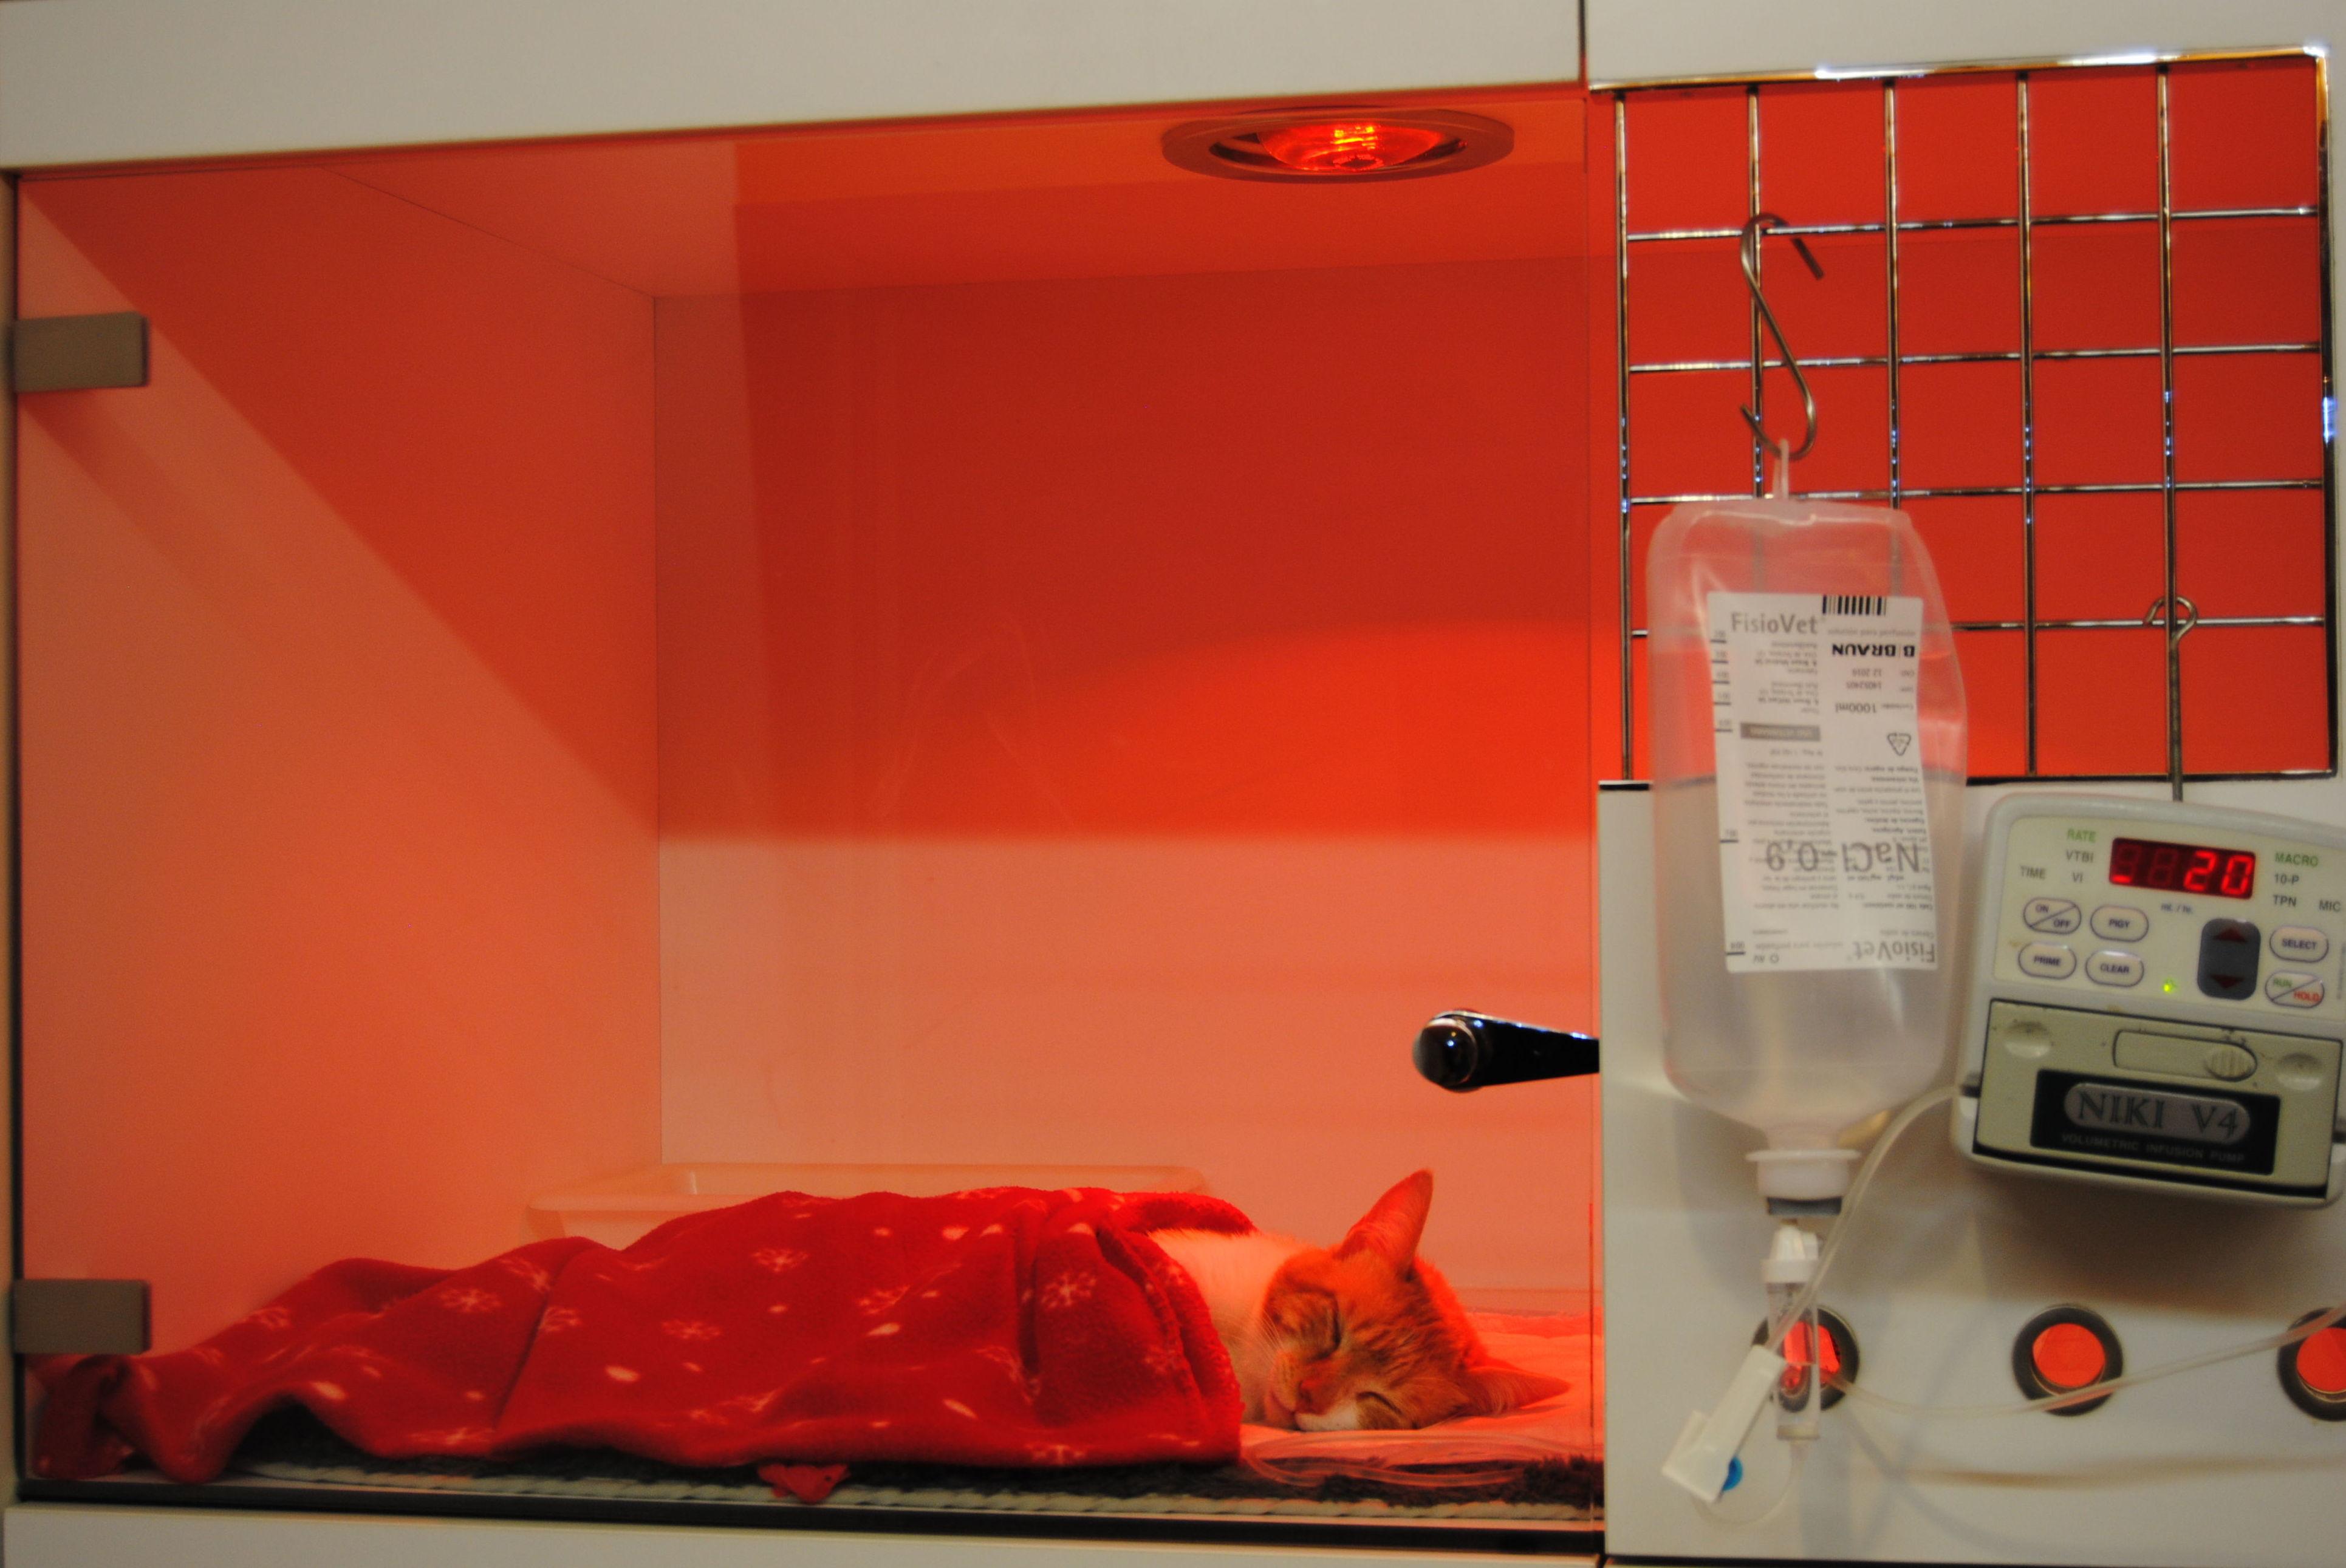 Transfusiones sangre gatos, urgencias 24 horas.